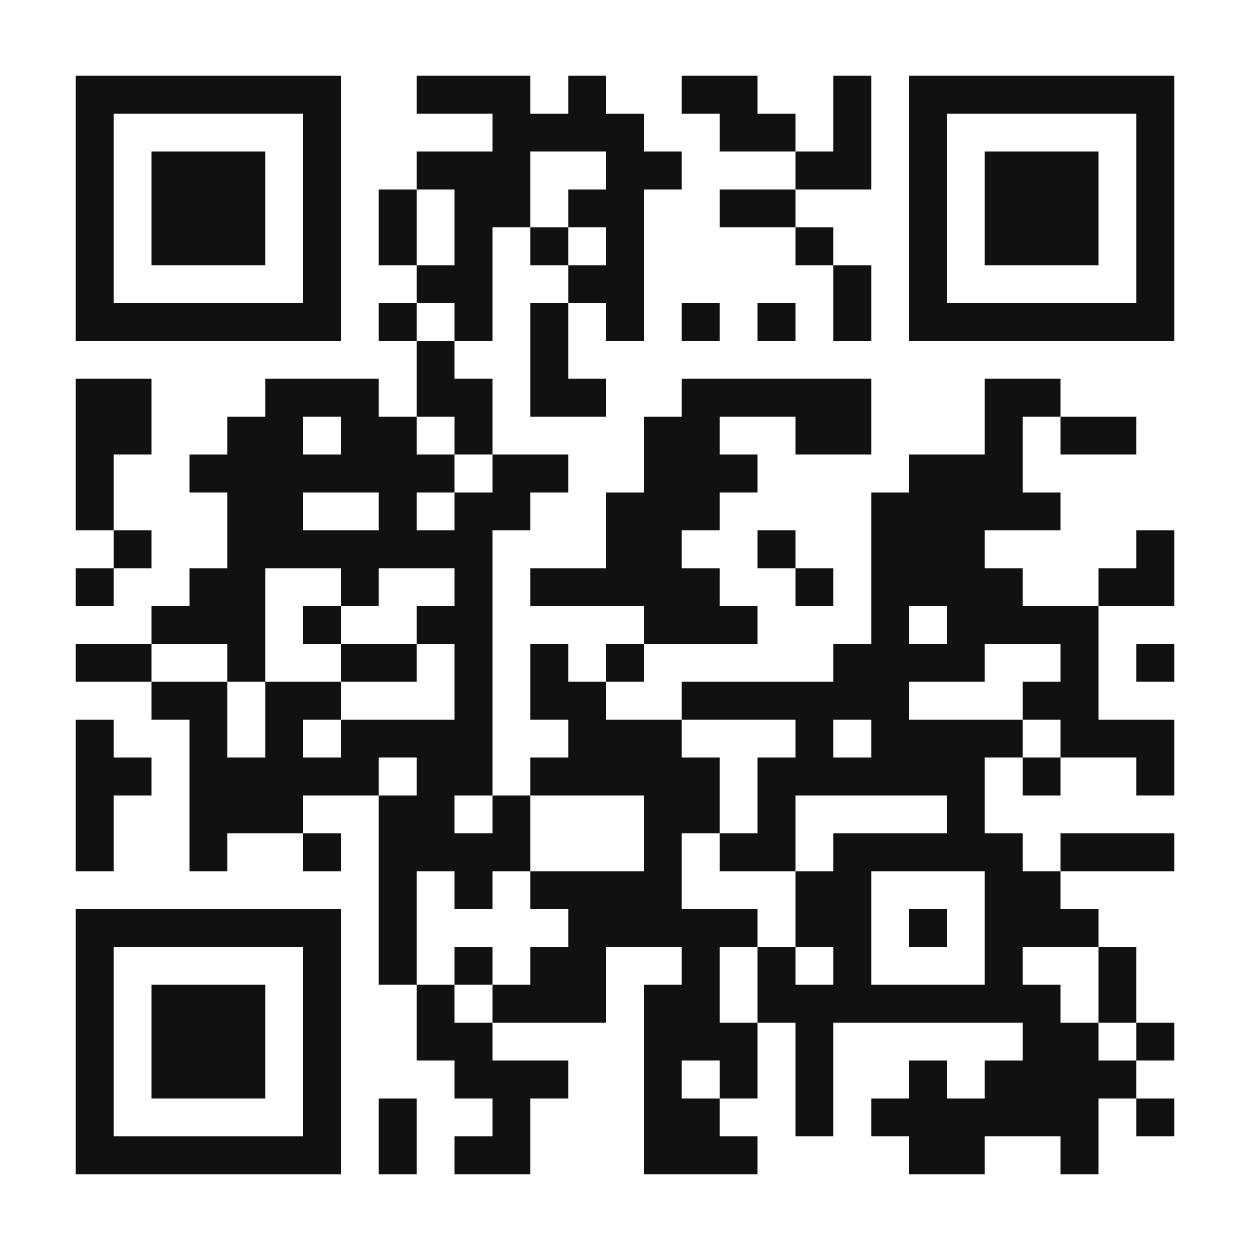 ManyChat flow editor screenshot for Chatbot de tarjeta de fidelización para estudios de pilates